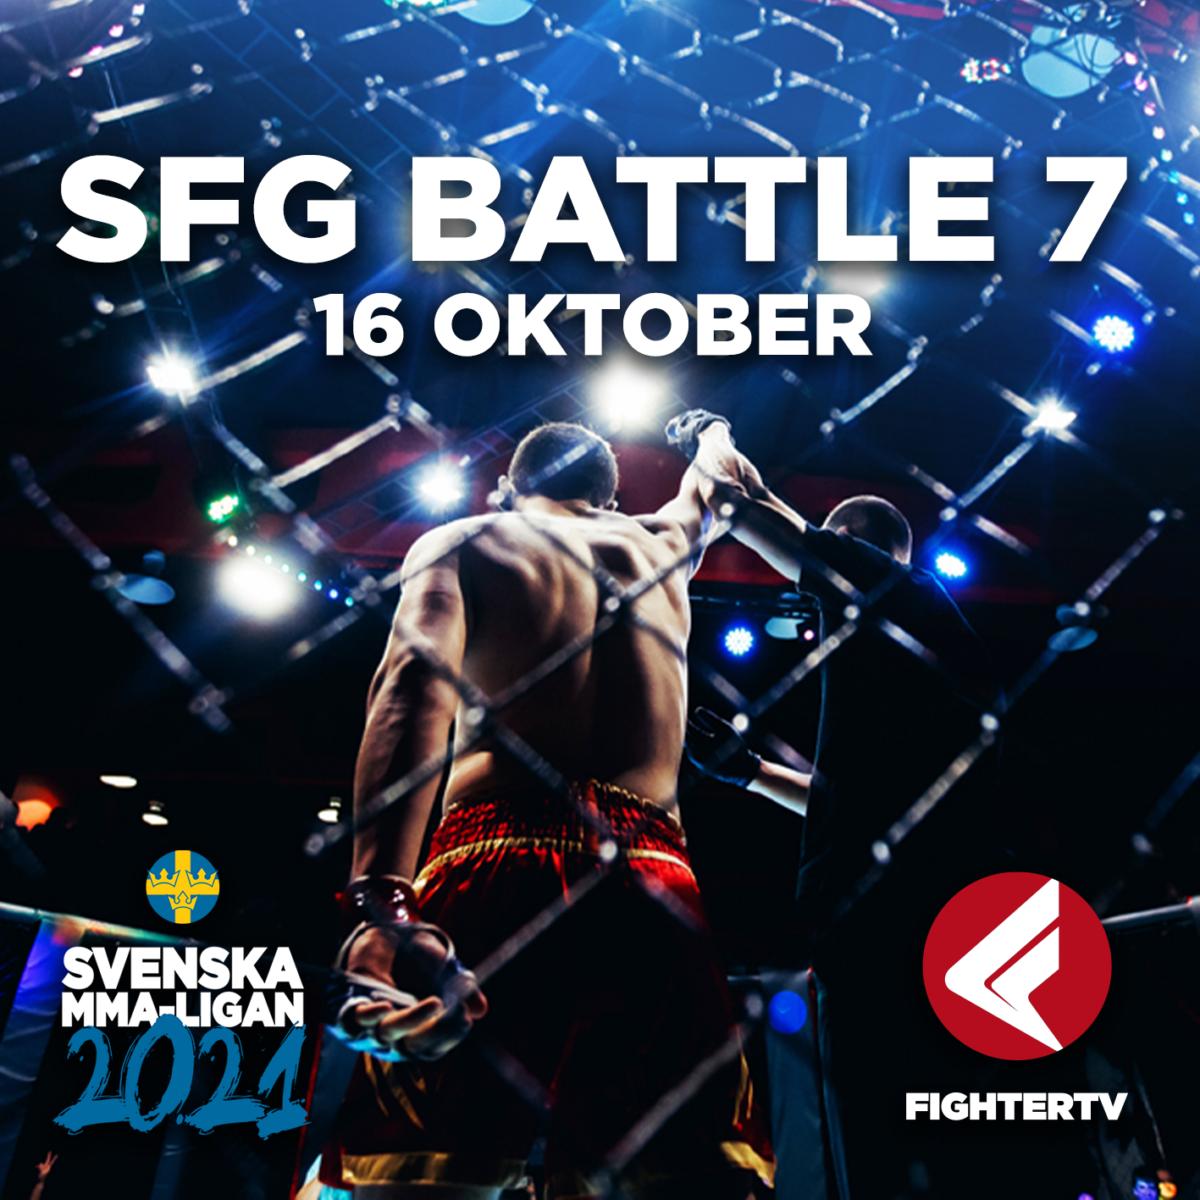 MMA-LIGAN 2021: SFG BATTLE 7